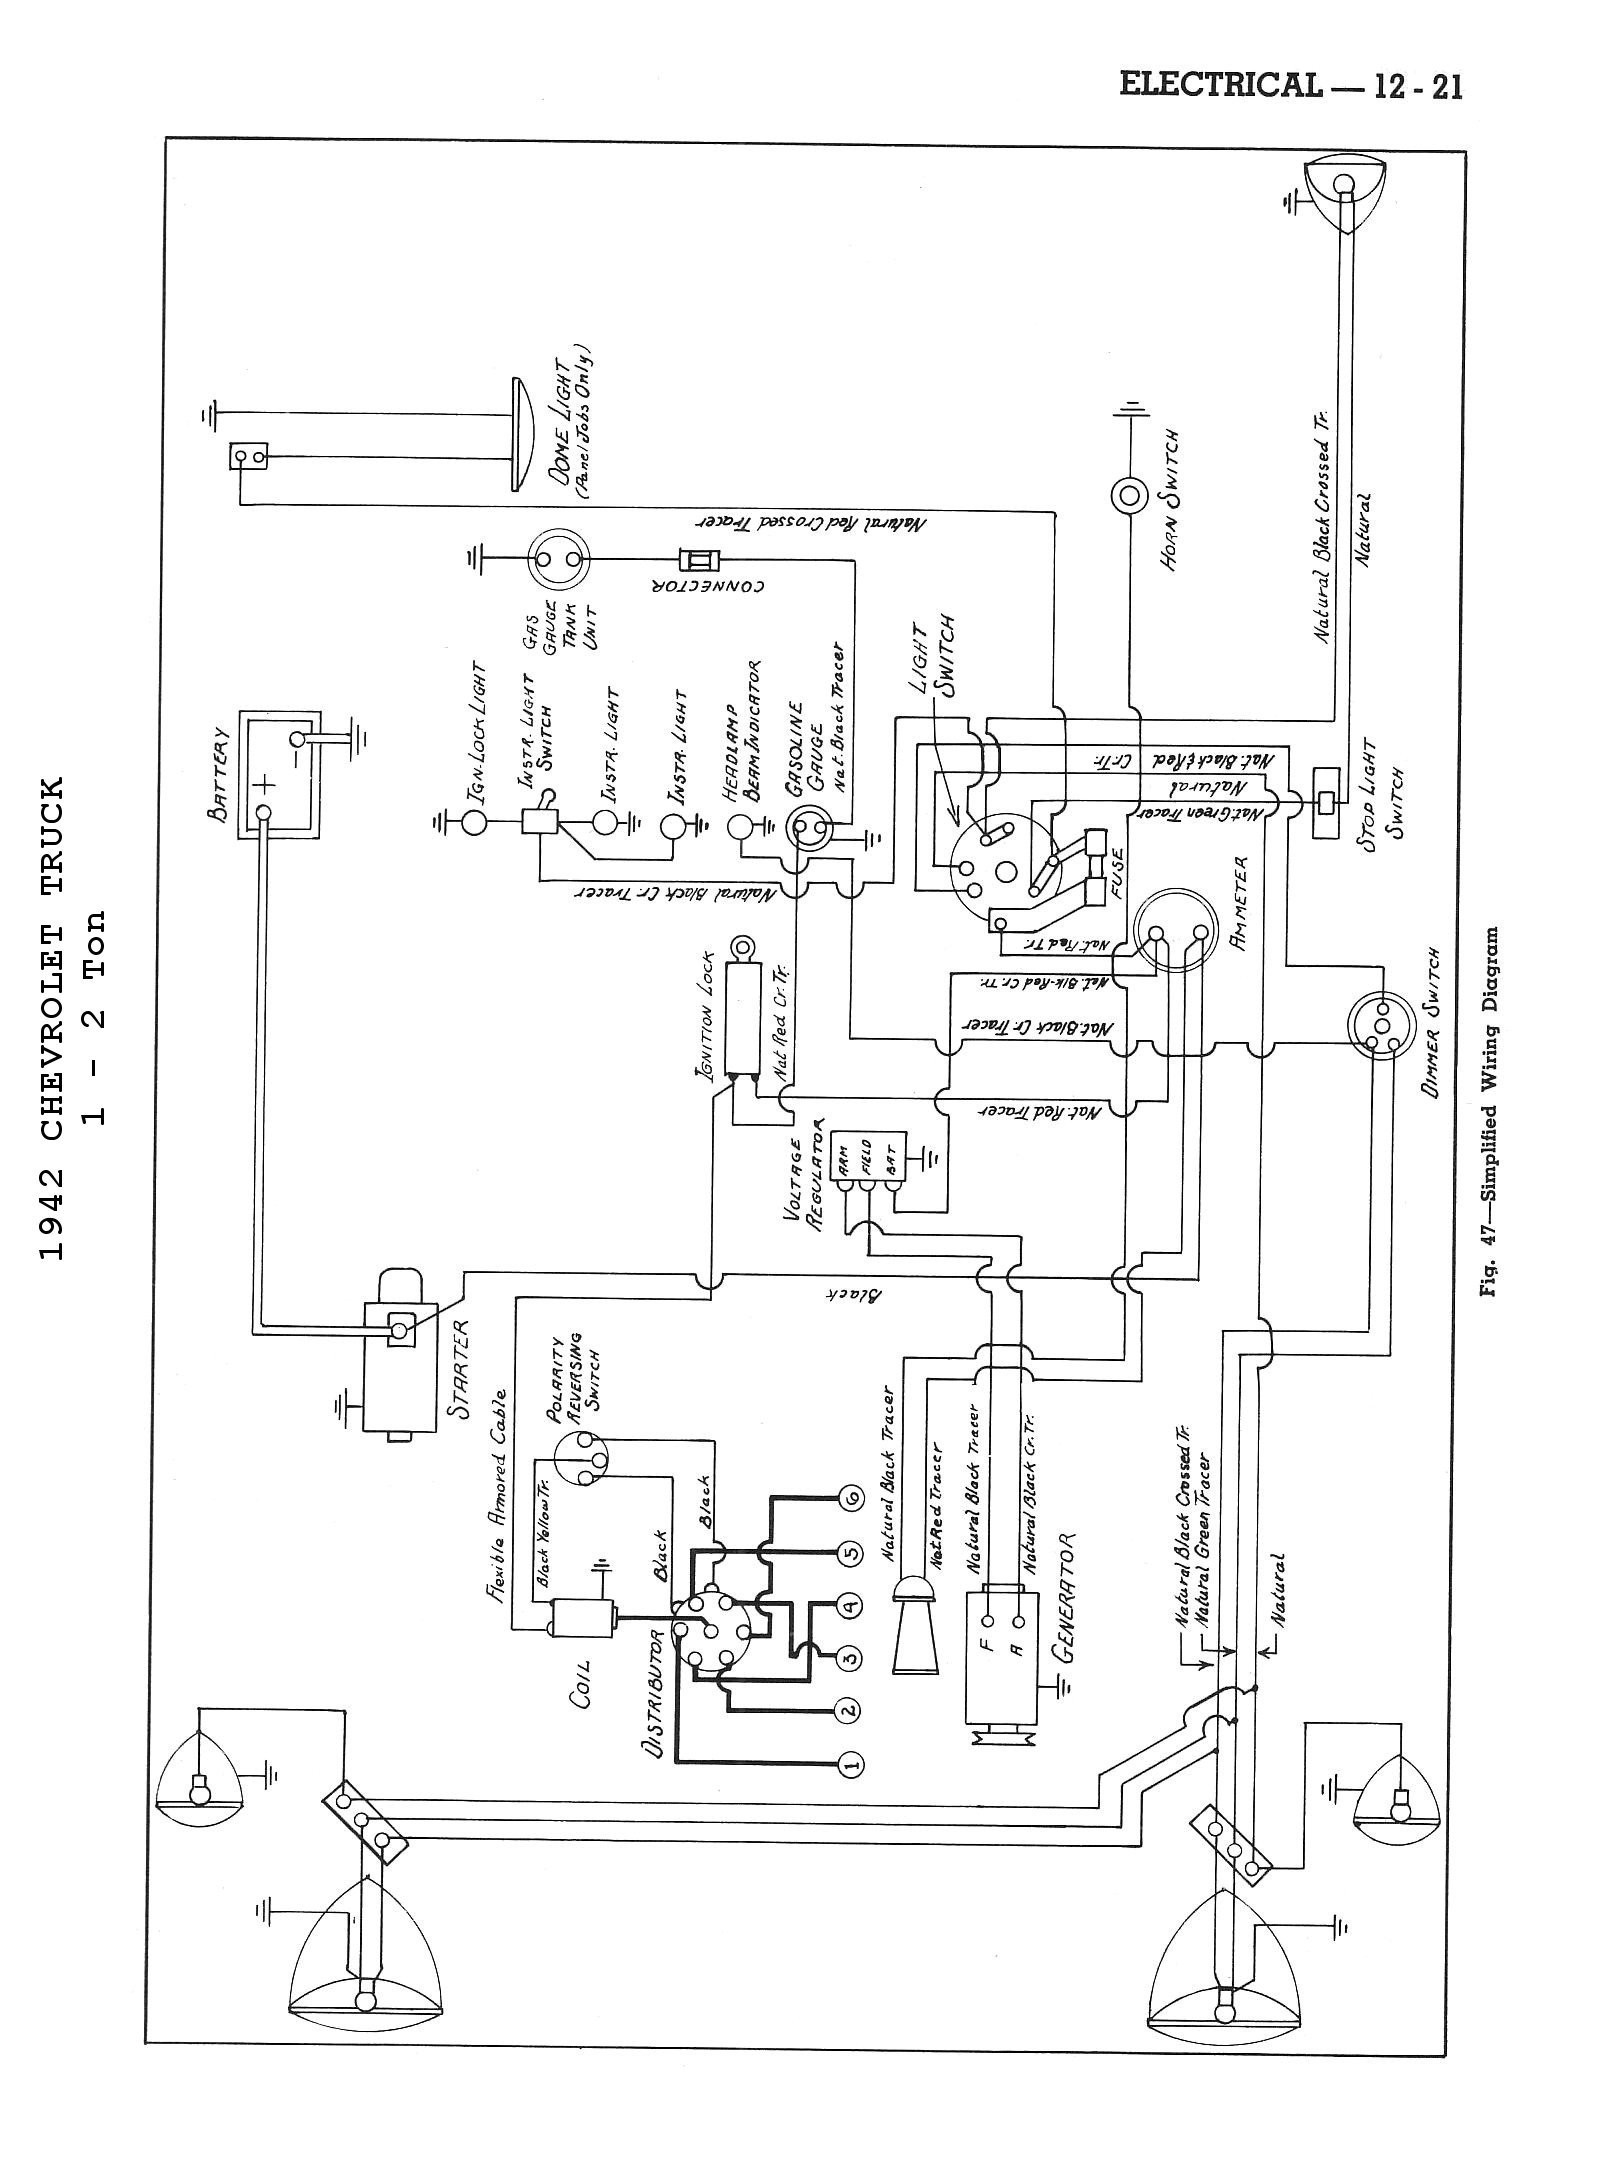 jcb alternator wiring diagram 3 way dimming switch turn signal unique image